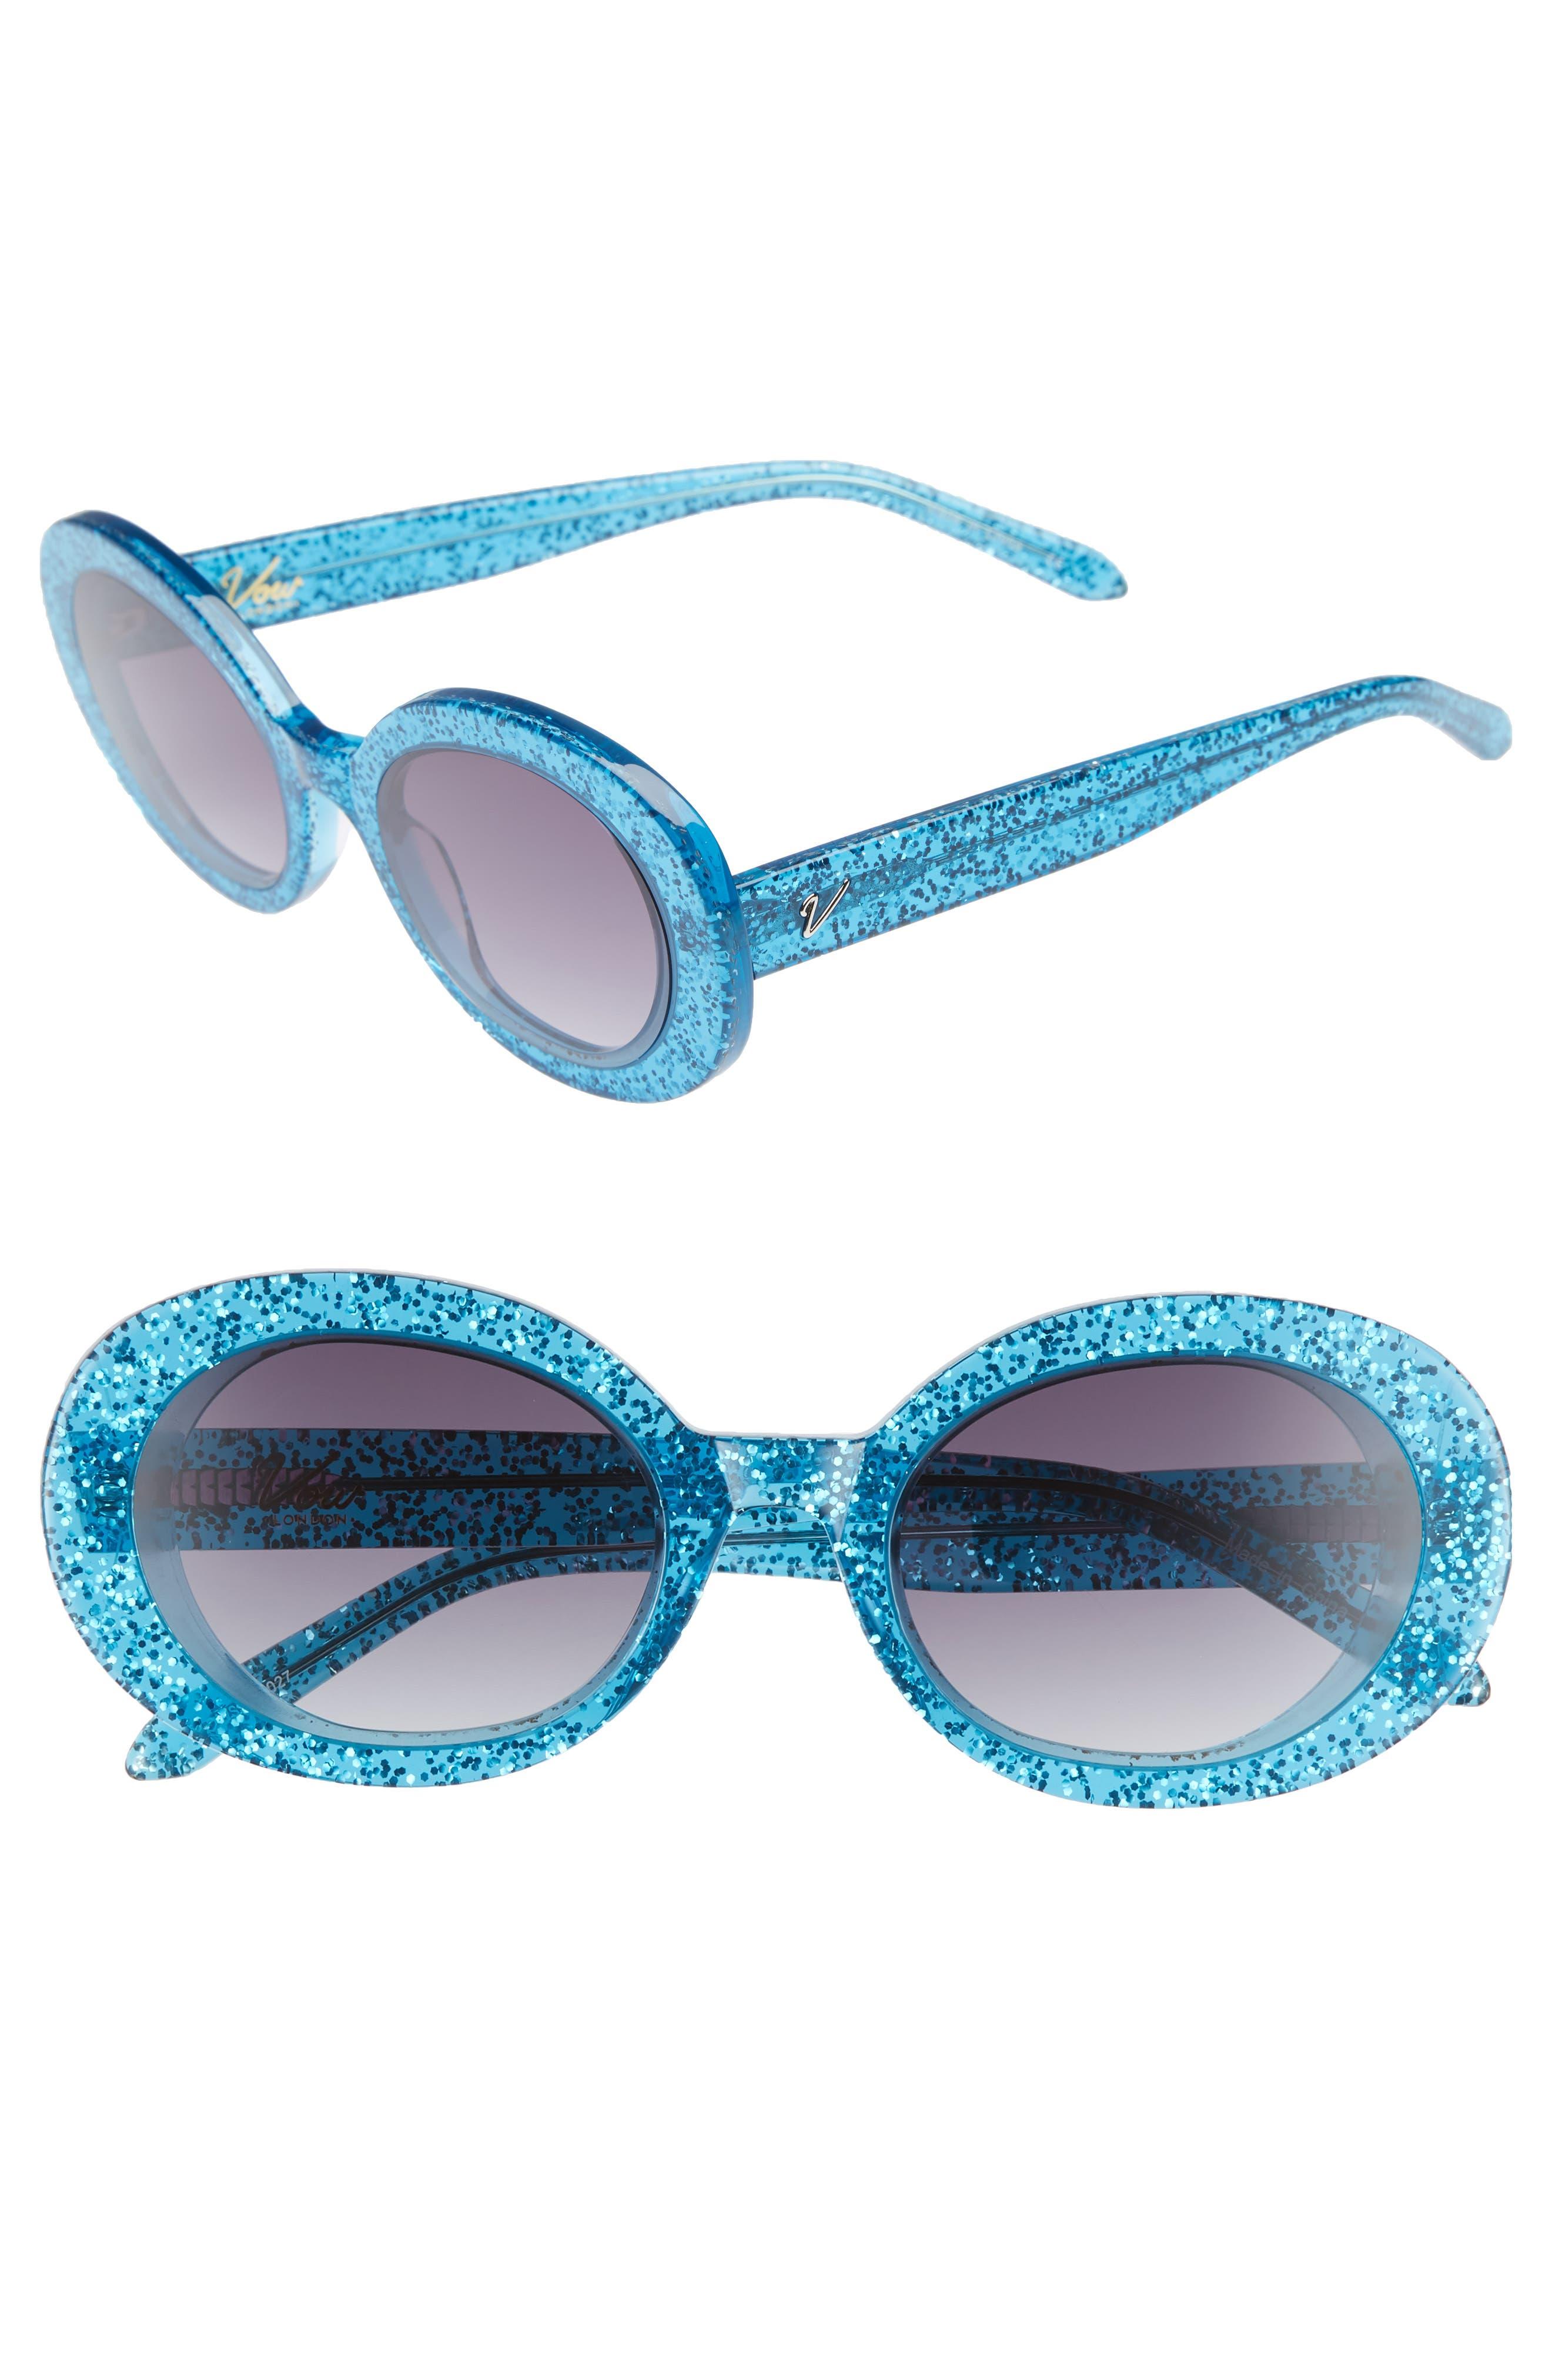 Selena 53mm Oval Sunglasses,                             Main thumbnail 1, color,                             BLUE GLITTER/ SMOKE